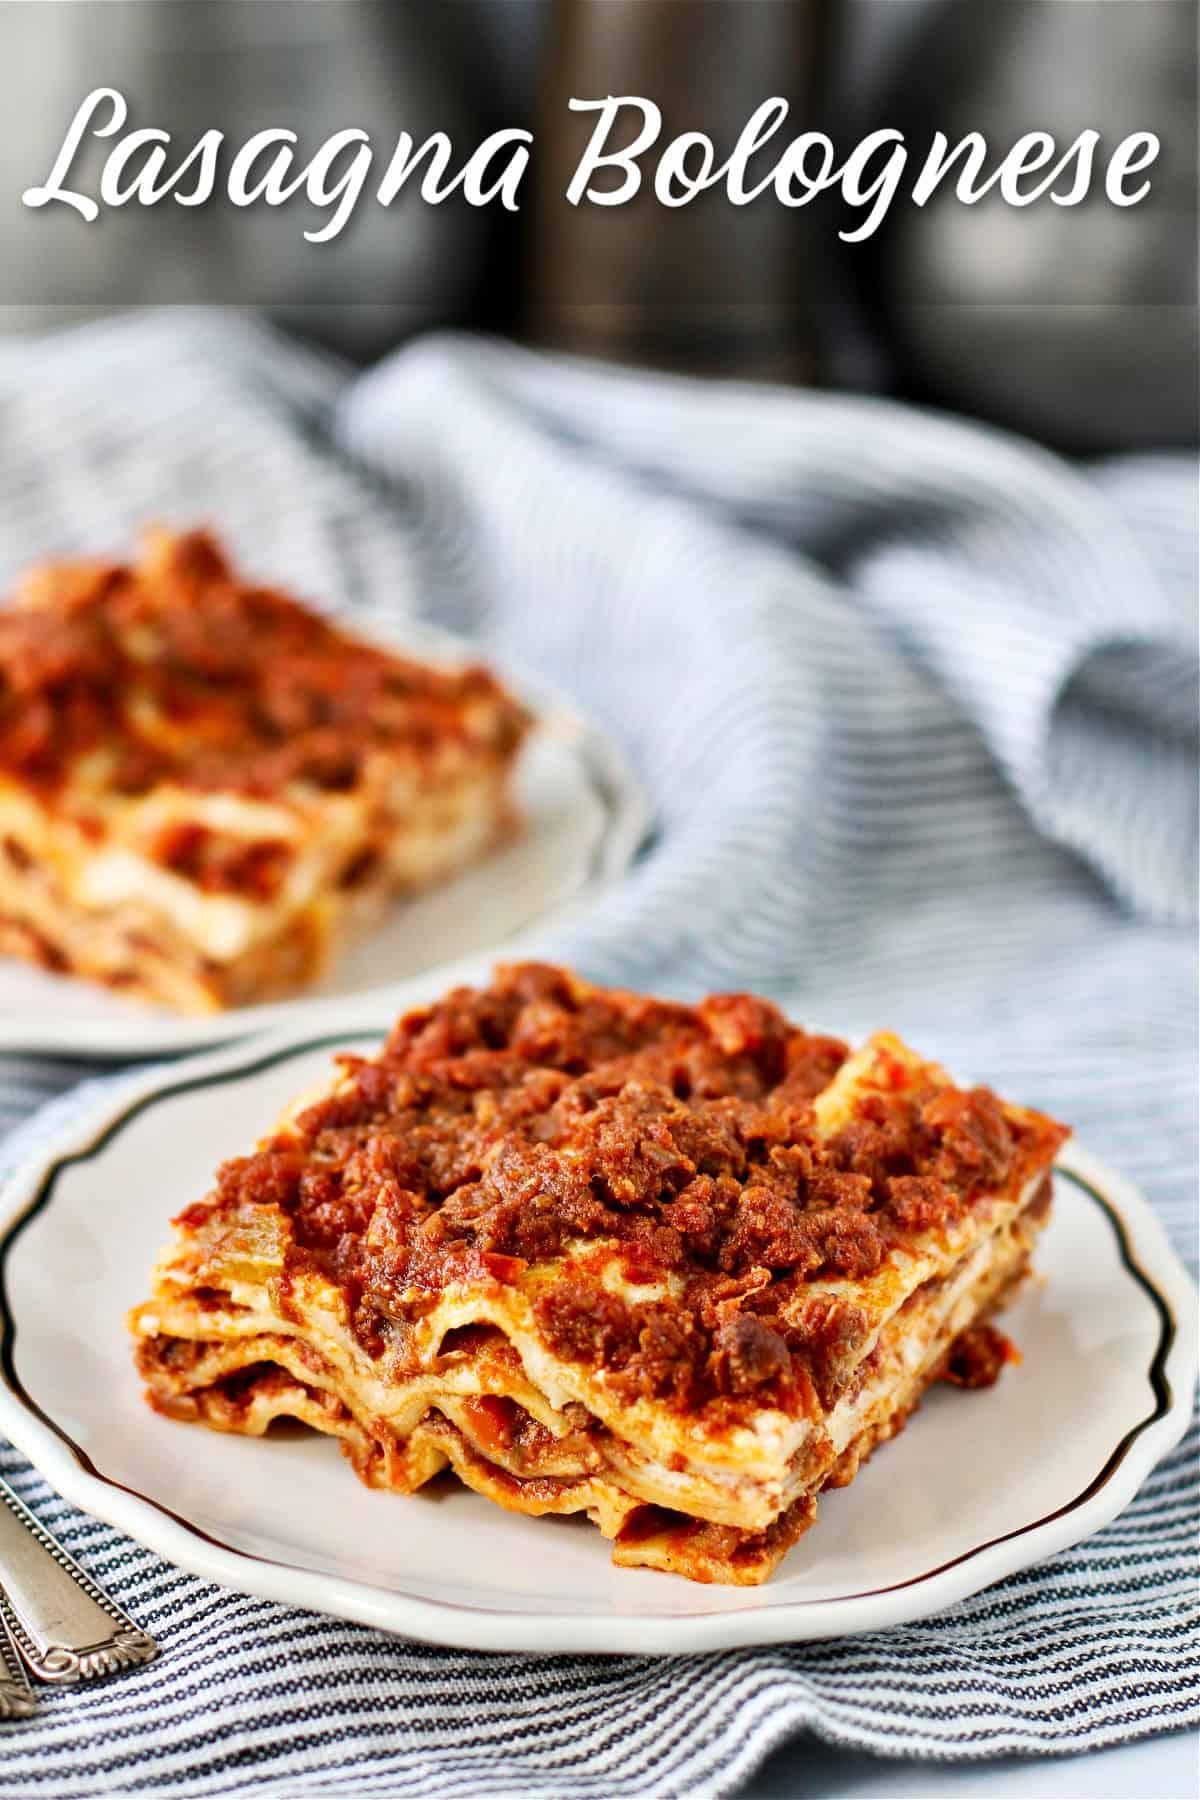 Lasagna Bolognese slices